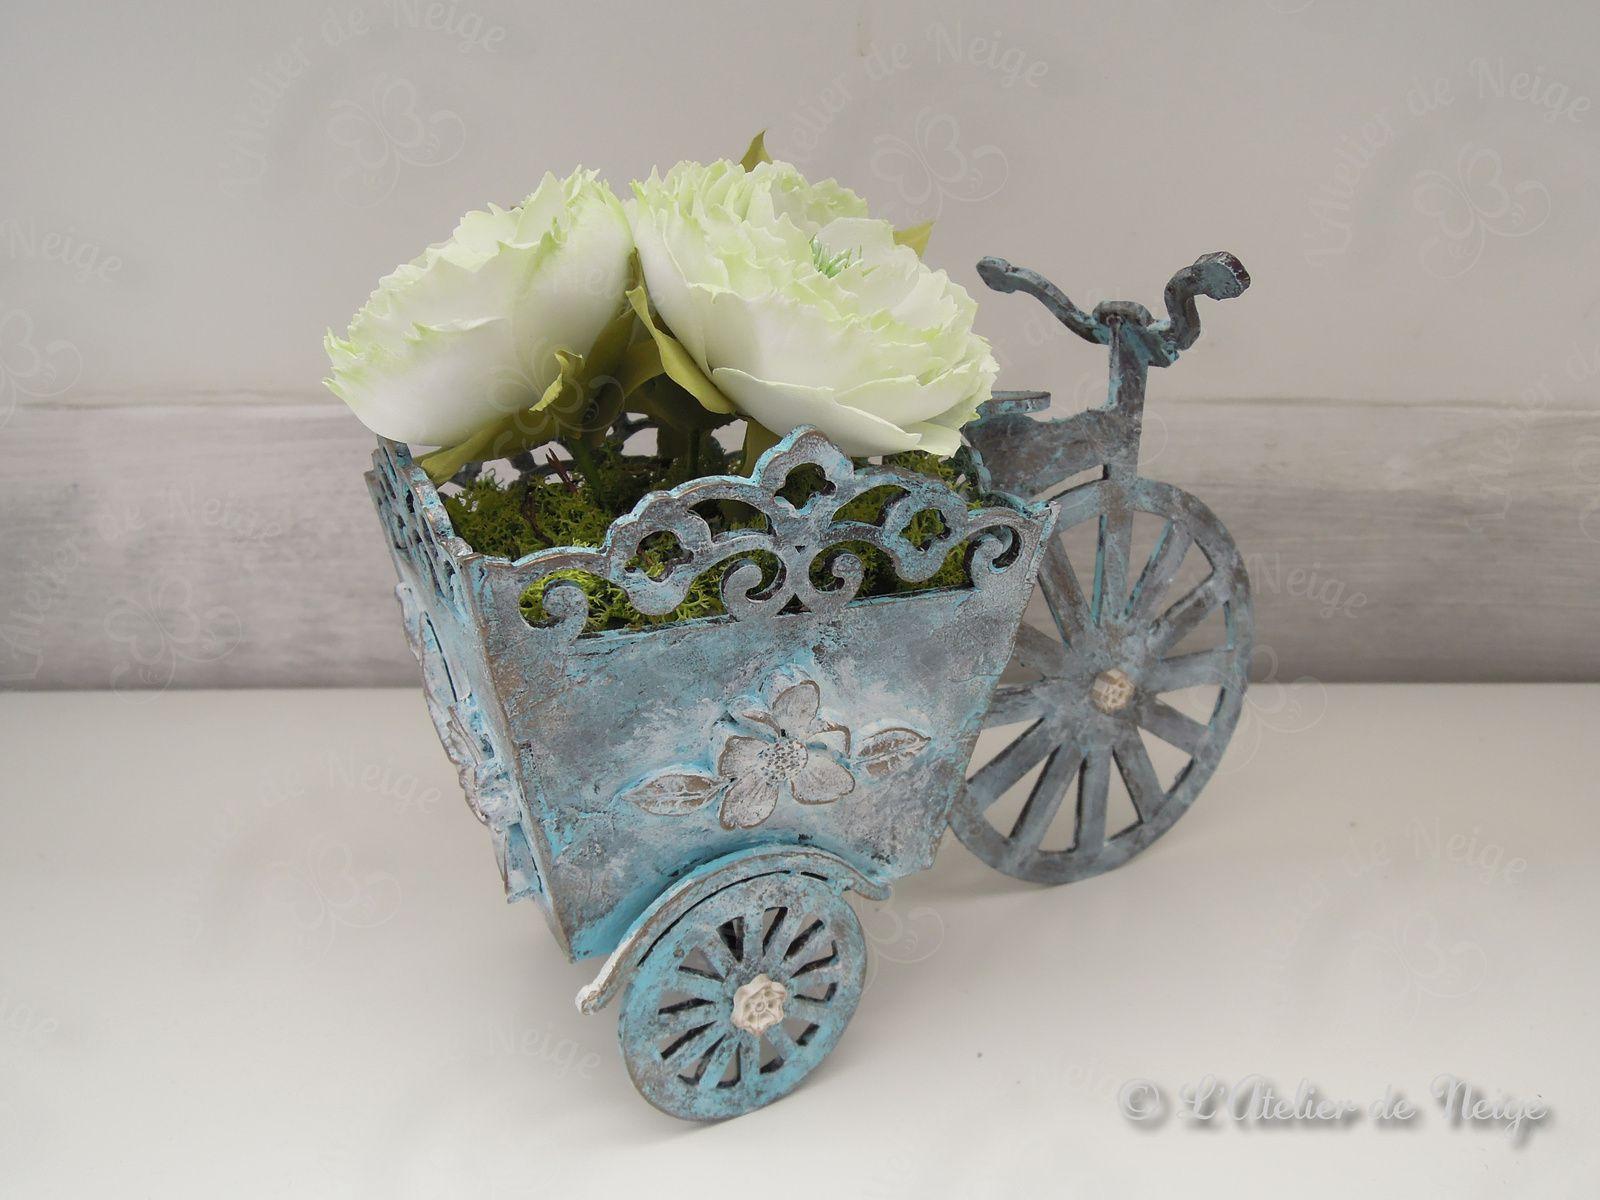 486 - Bicyclette Vintage Pivoine Blanche Brigitte 25 juin 2021